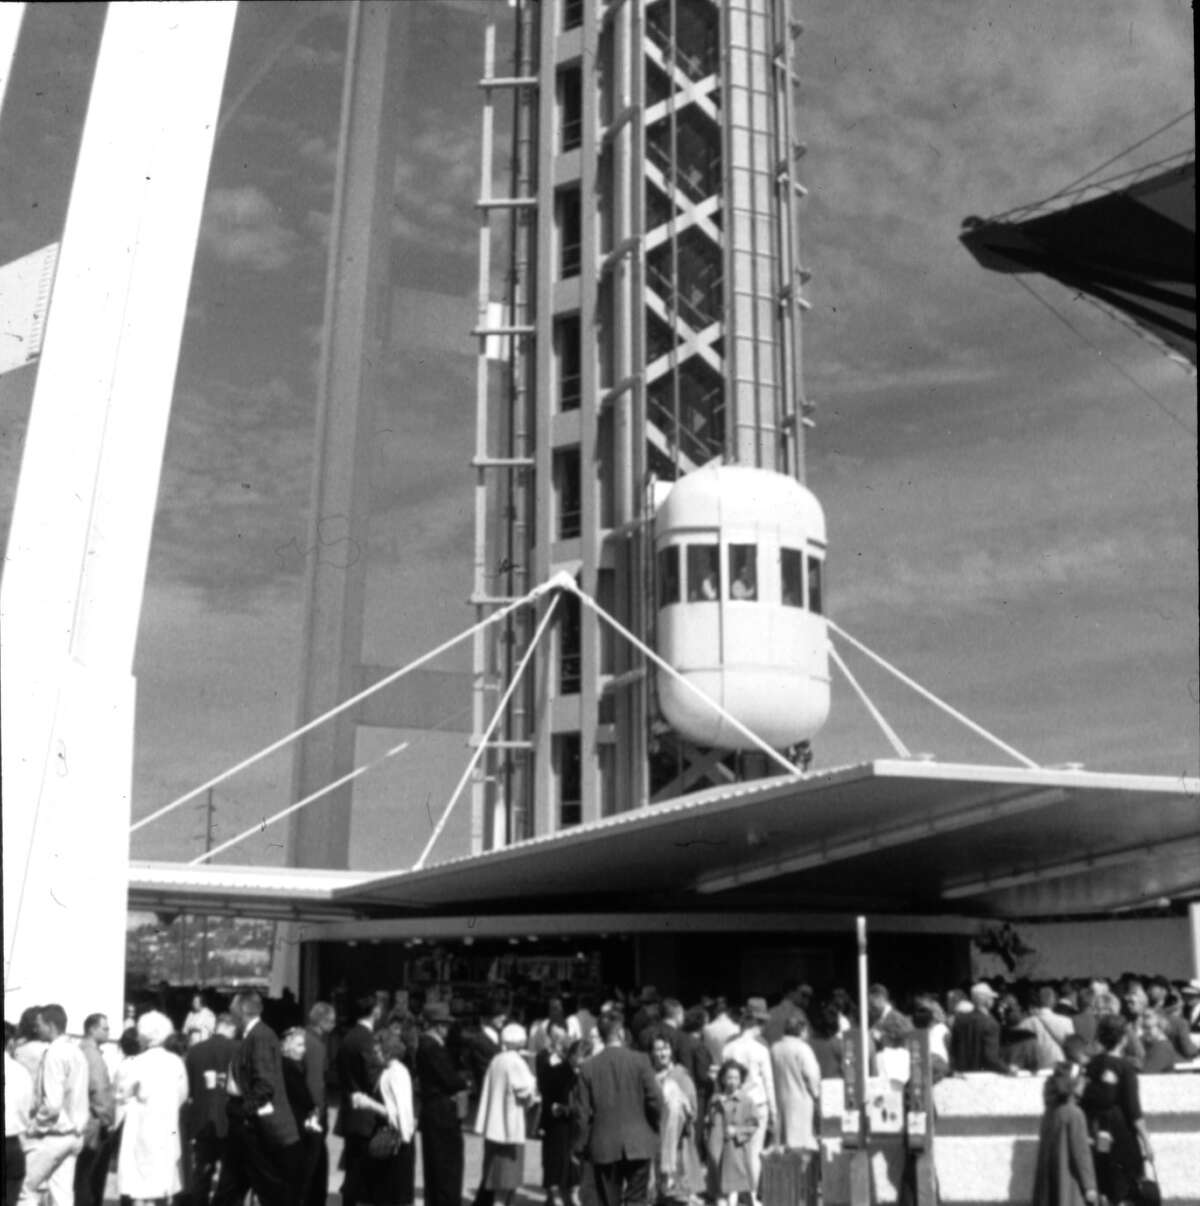 Century 21 / Seattle World's Fair 1962. [Space] Needle Elevator at Base. Item No: 73090